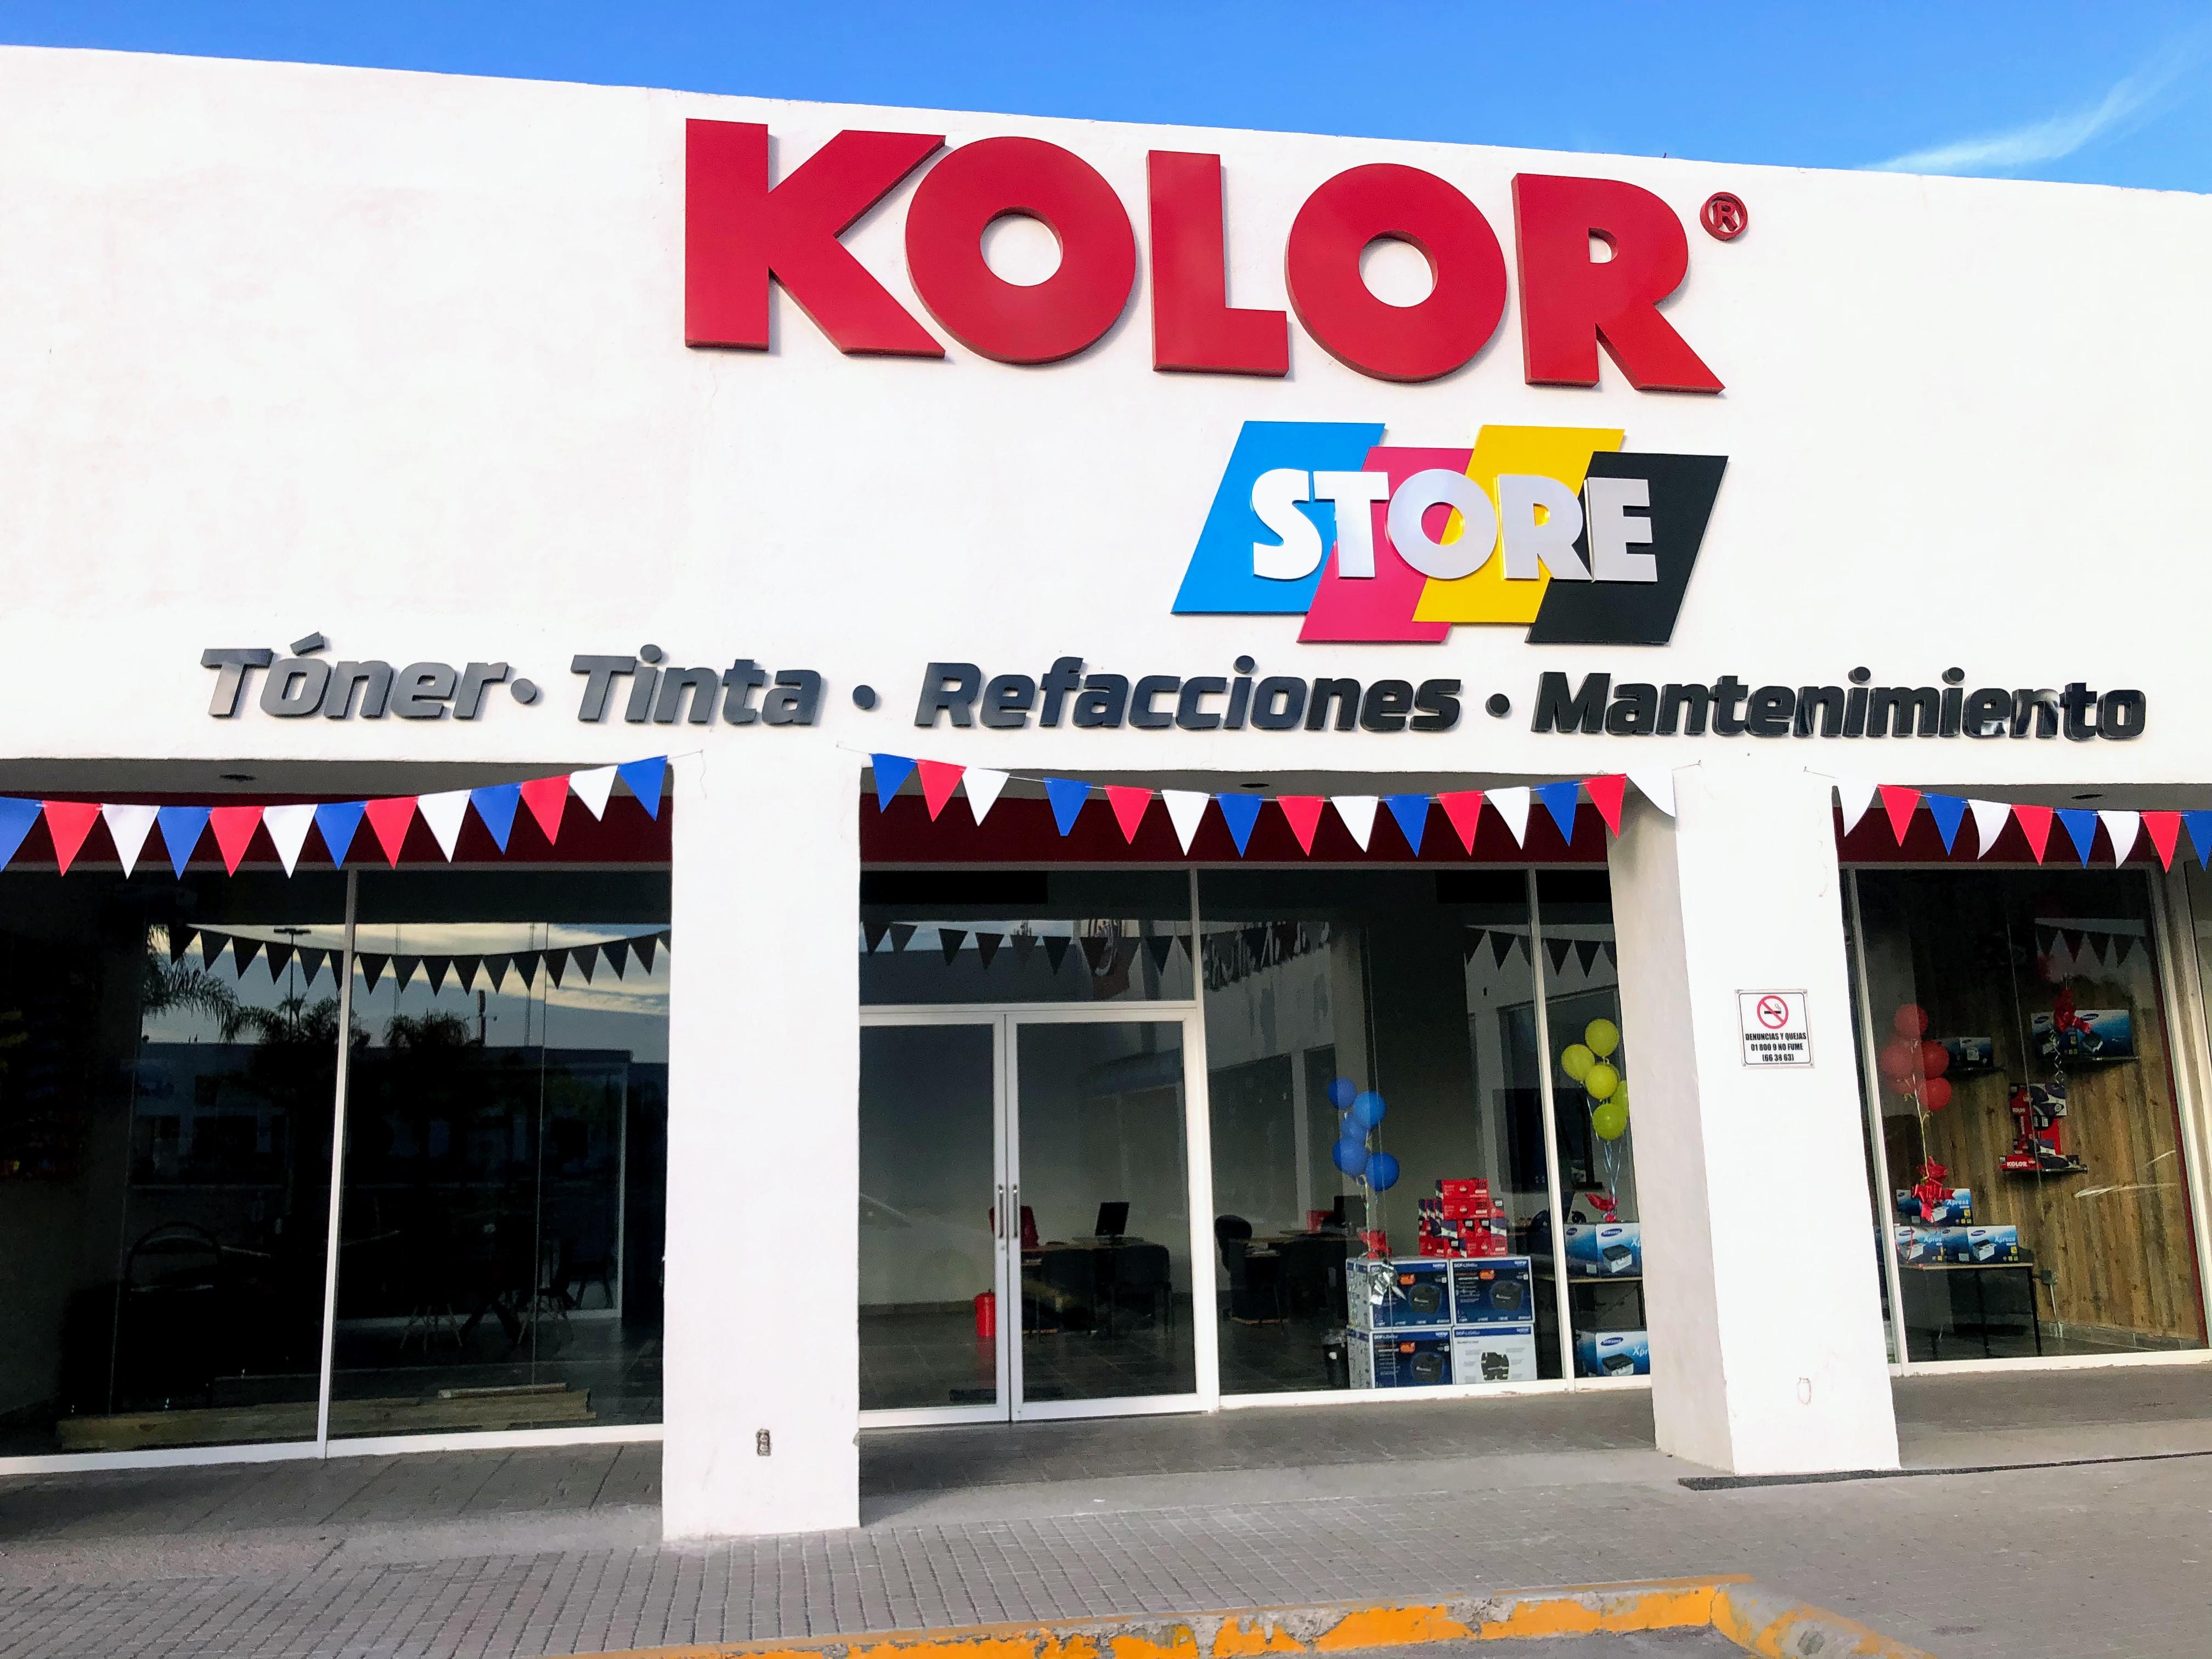 Kolor Store